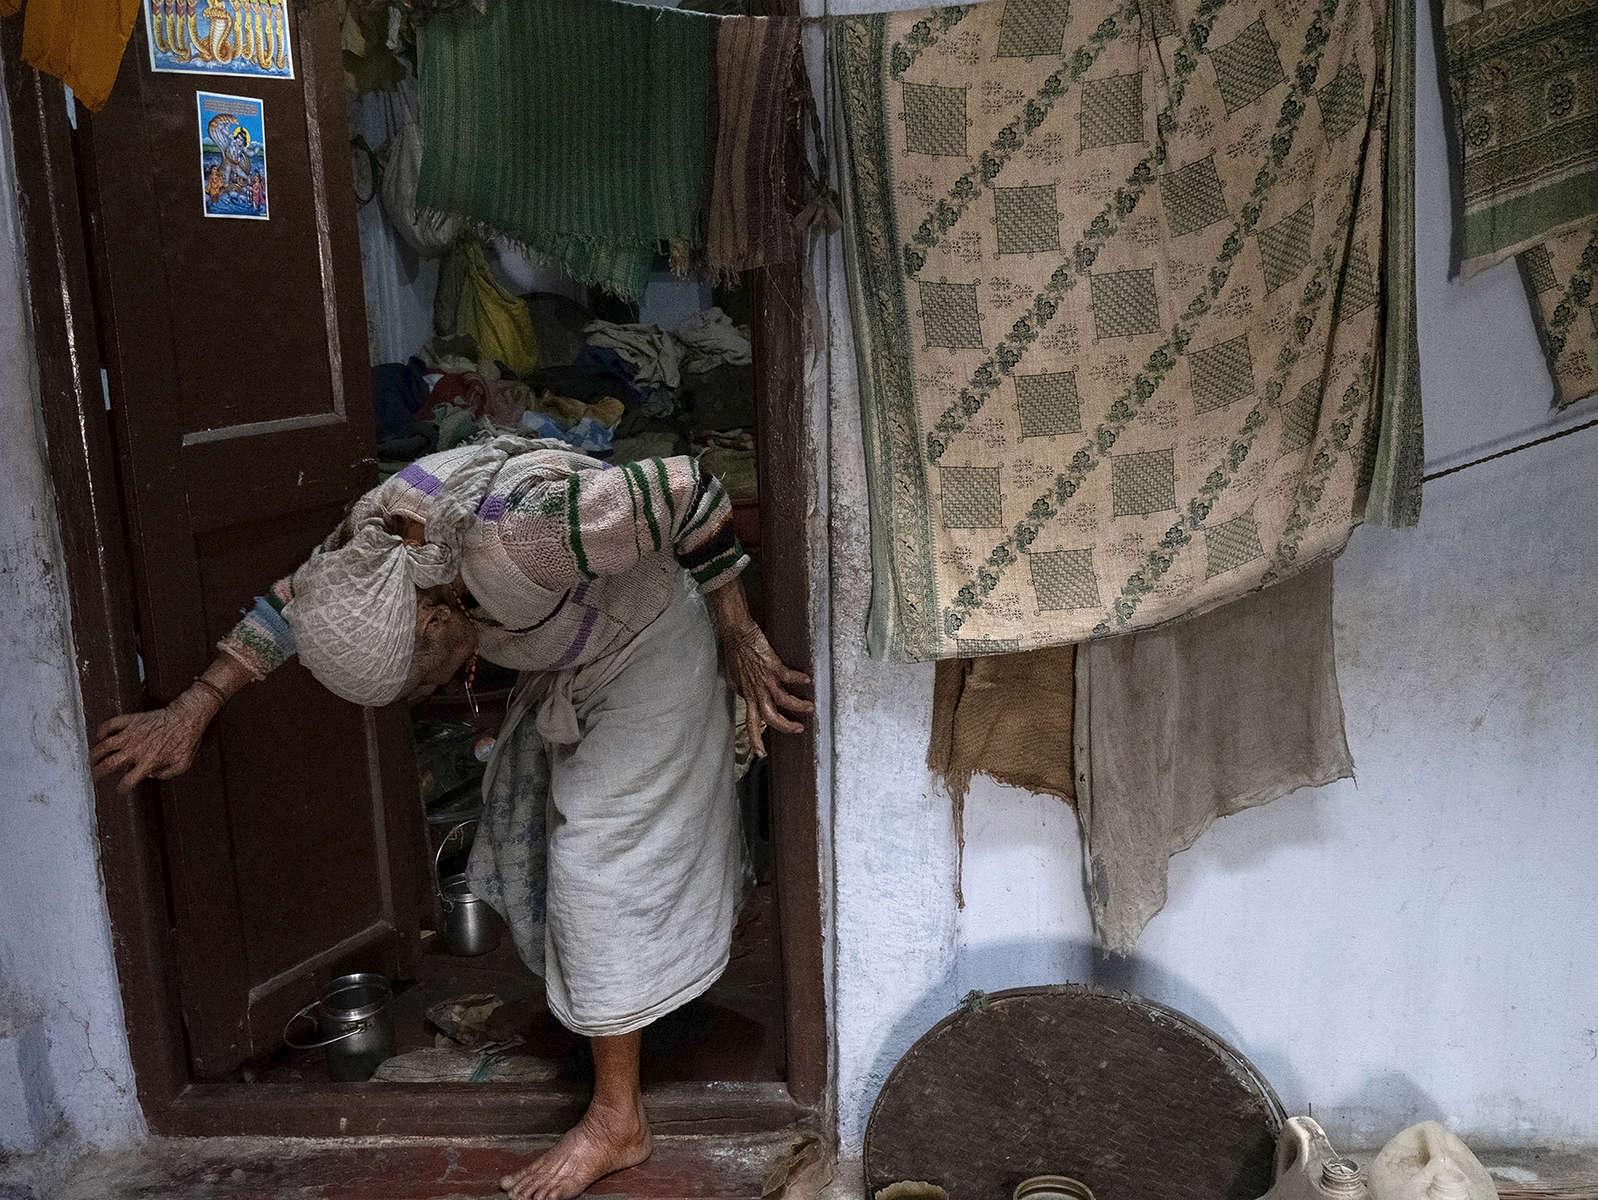 A widow exits her room at Pashupatinath Ashram in Varanasi, India on January 06, 2019.